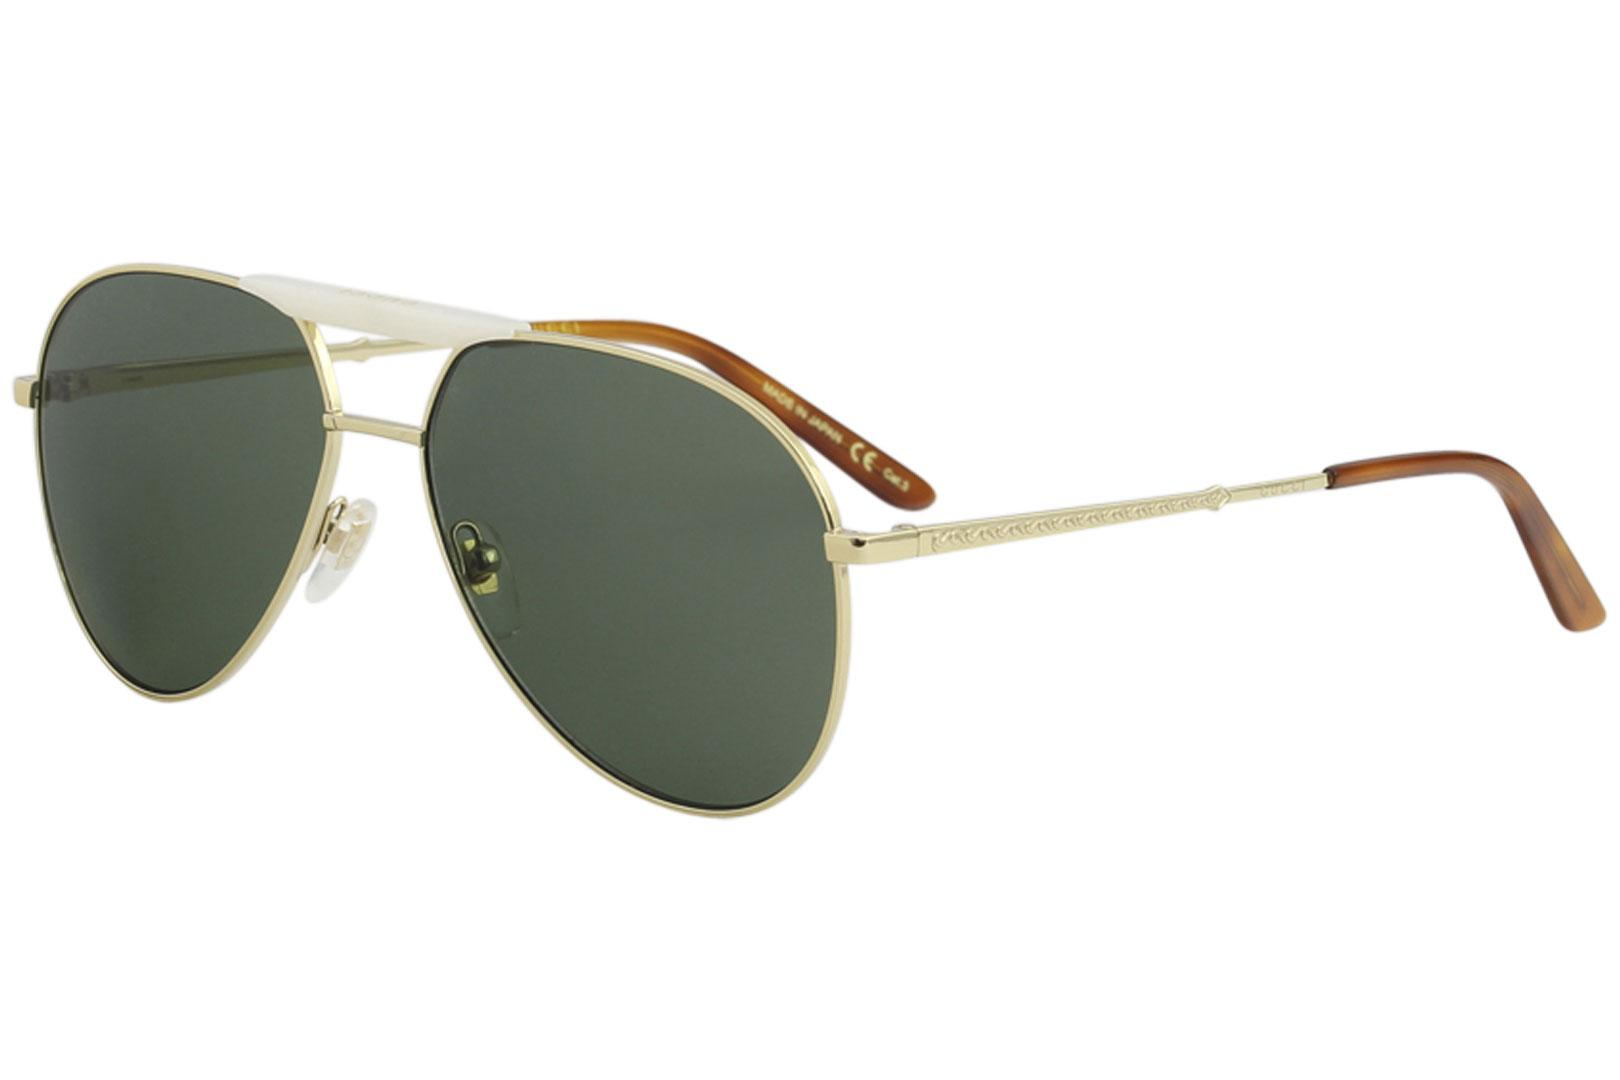 b83832e38d Gucci Men s GG0242S GG 0242 S 003 Gold Fashion Pilot Sunglasses 59mm ...